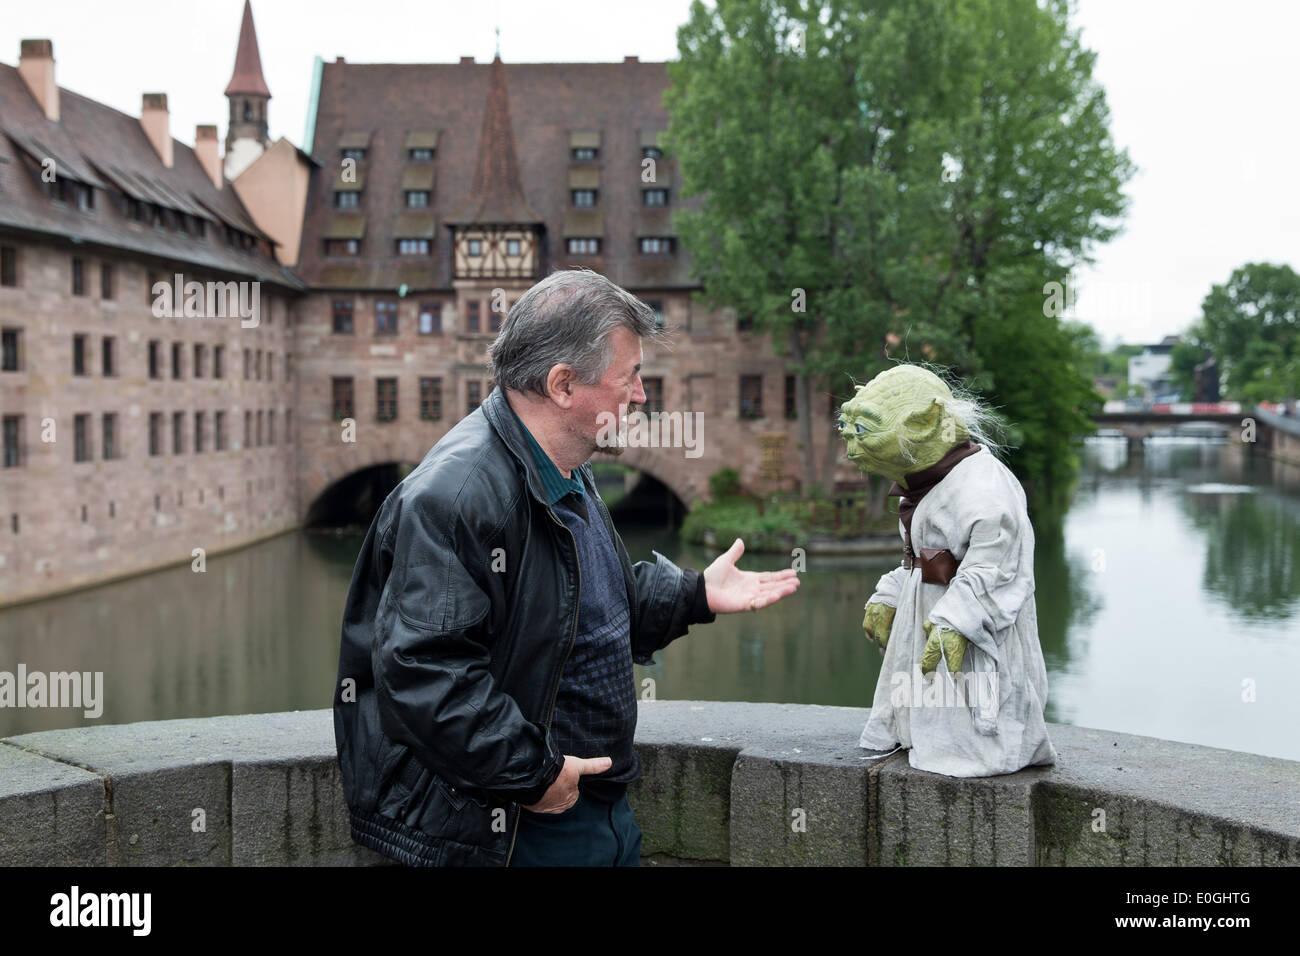 Nuremberg, Germany. 07th May, 2014. Make-up artist Nick Maley, one ...